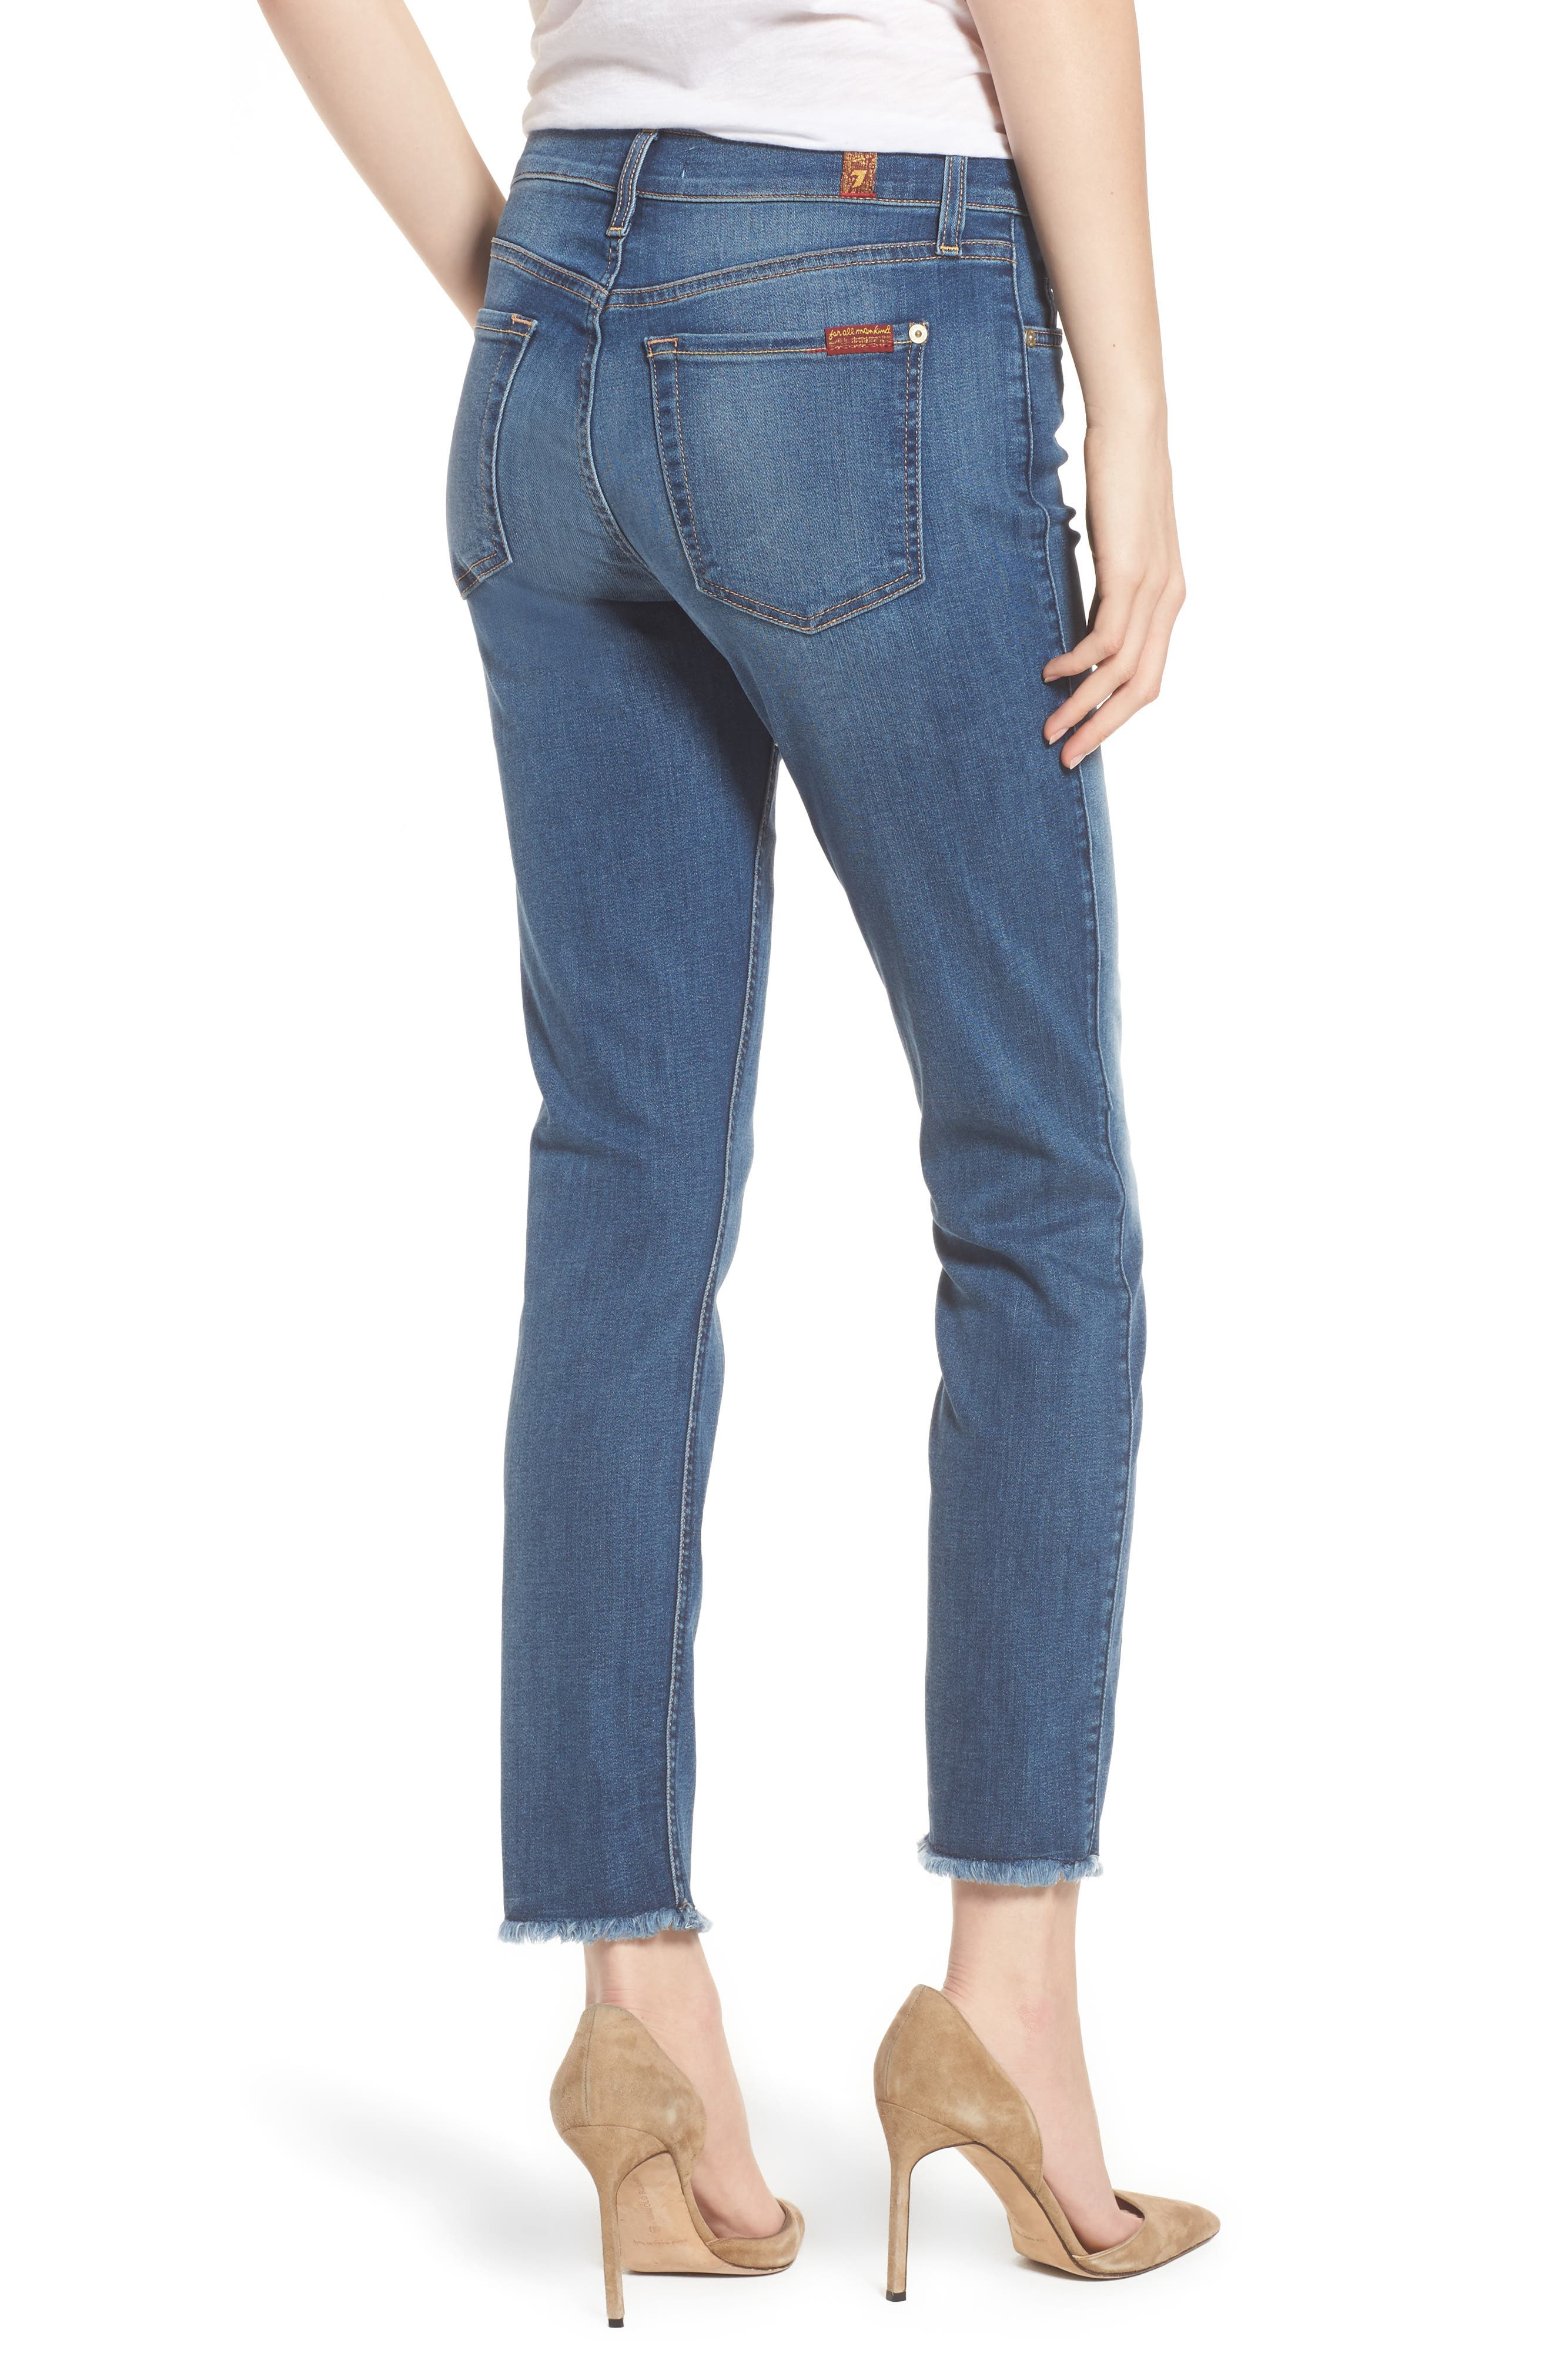 7 FOR ALL MANKIND<SUP>®</SUP>, b(air) Roxanne Ankle Straight Leg Jeans, Alternate thumbnail 2, color, BAIR VINTAGE DUSK